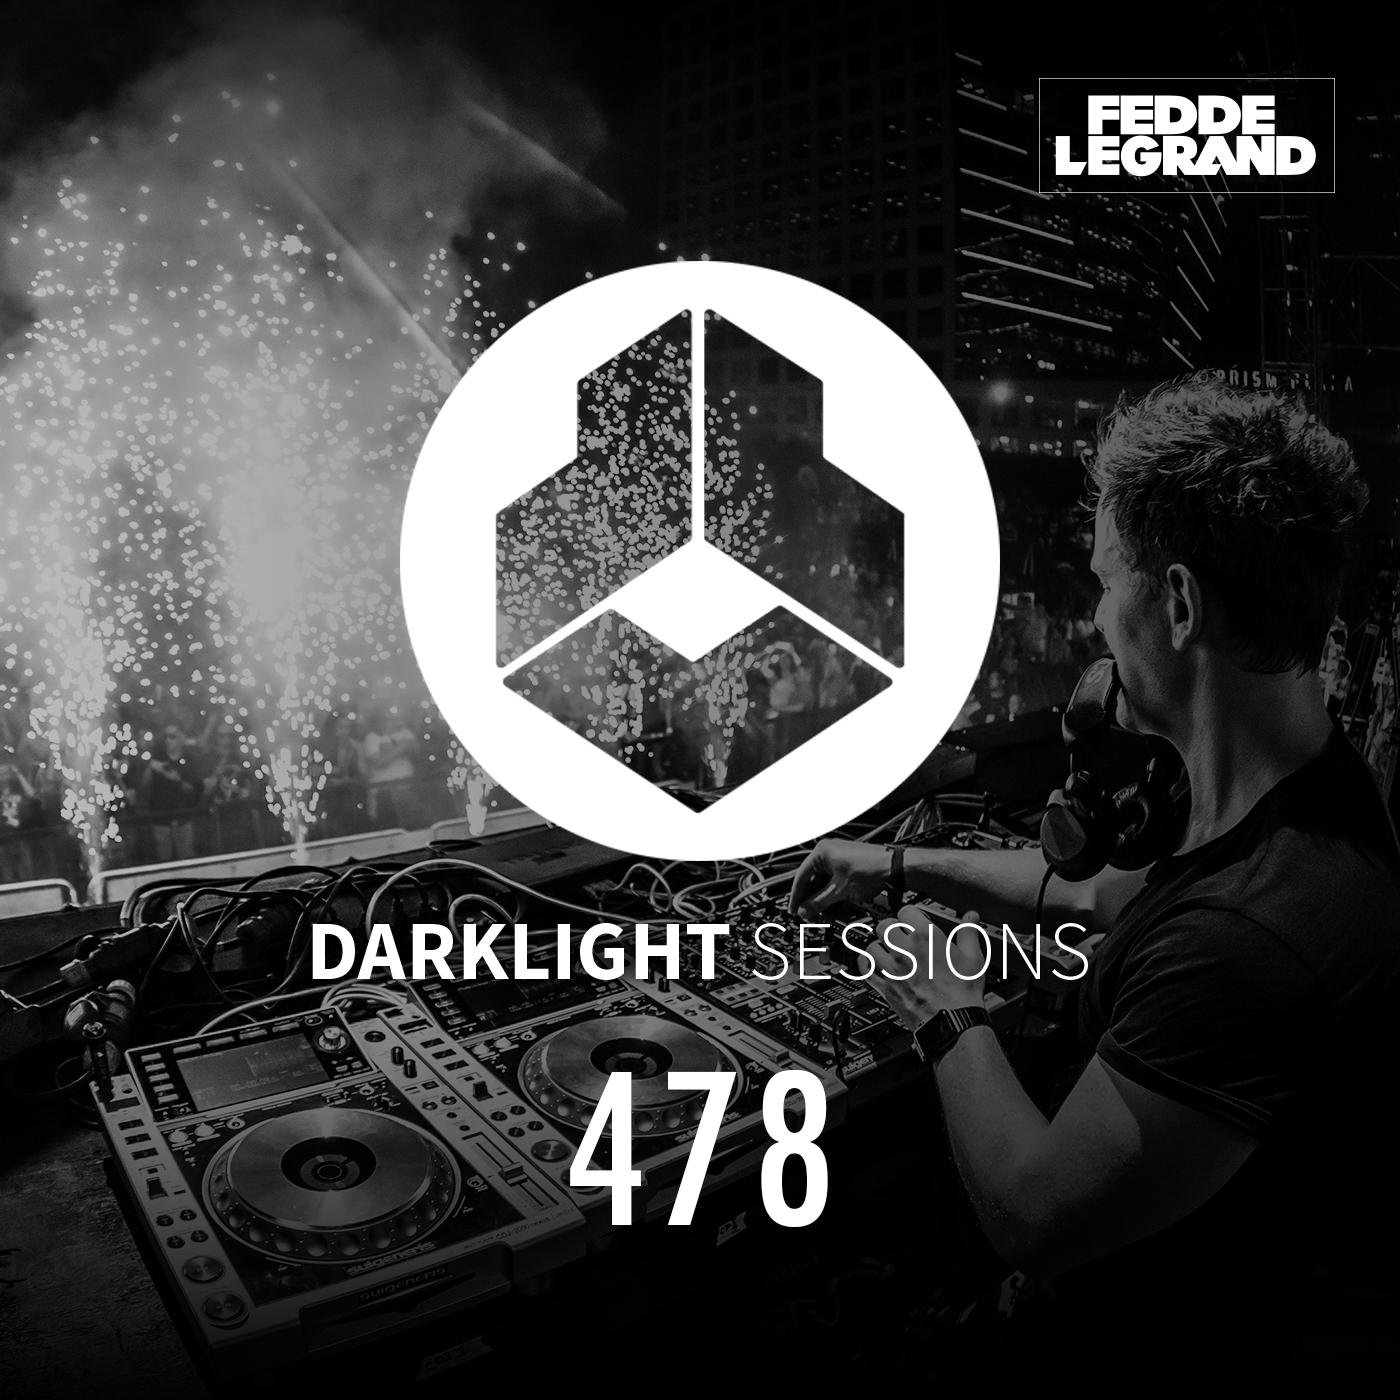 Darklight Sessions 478